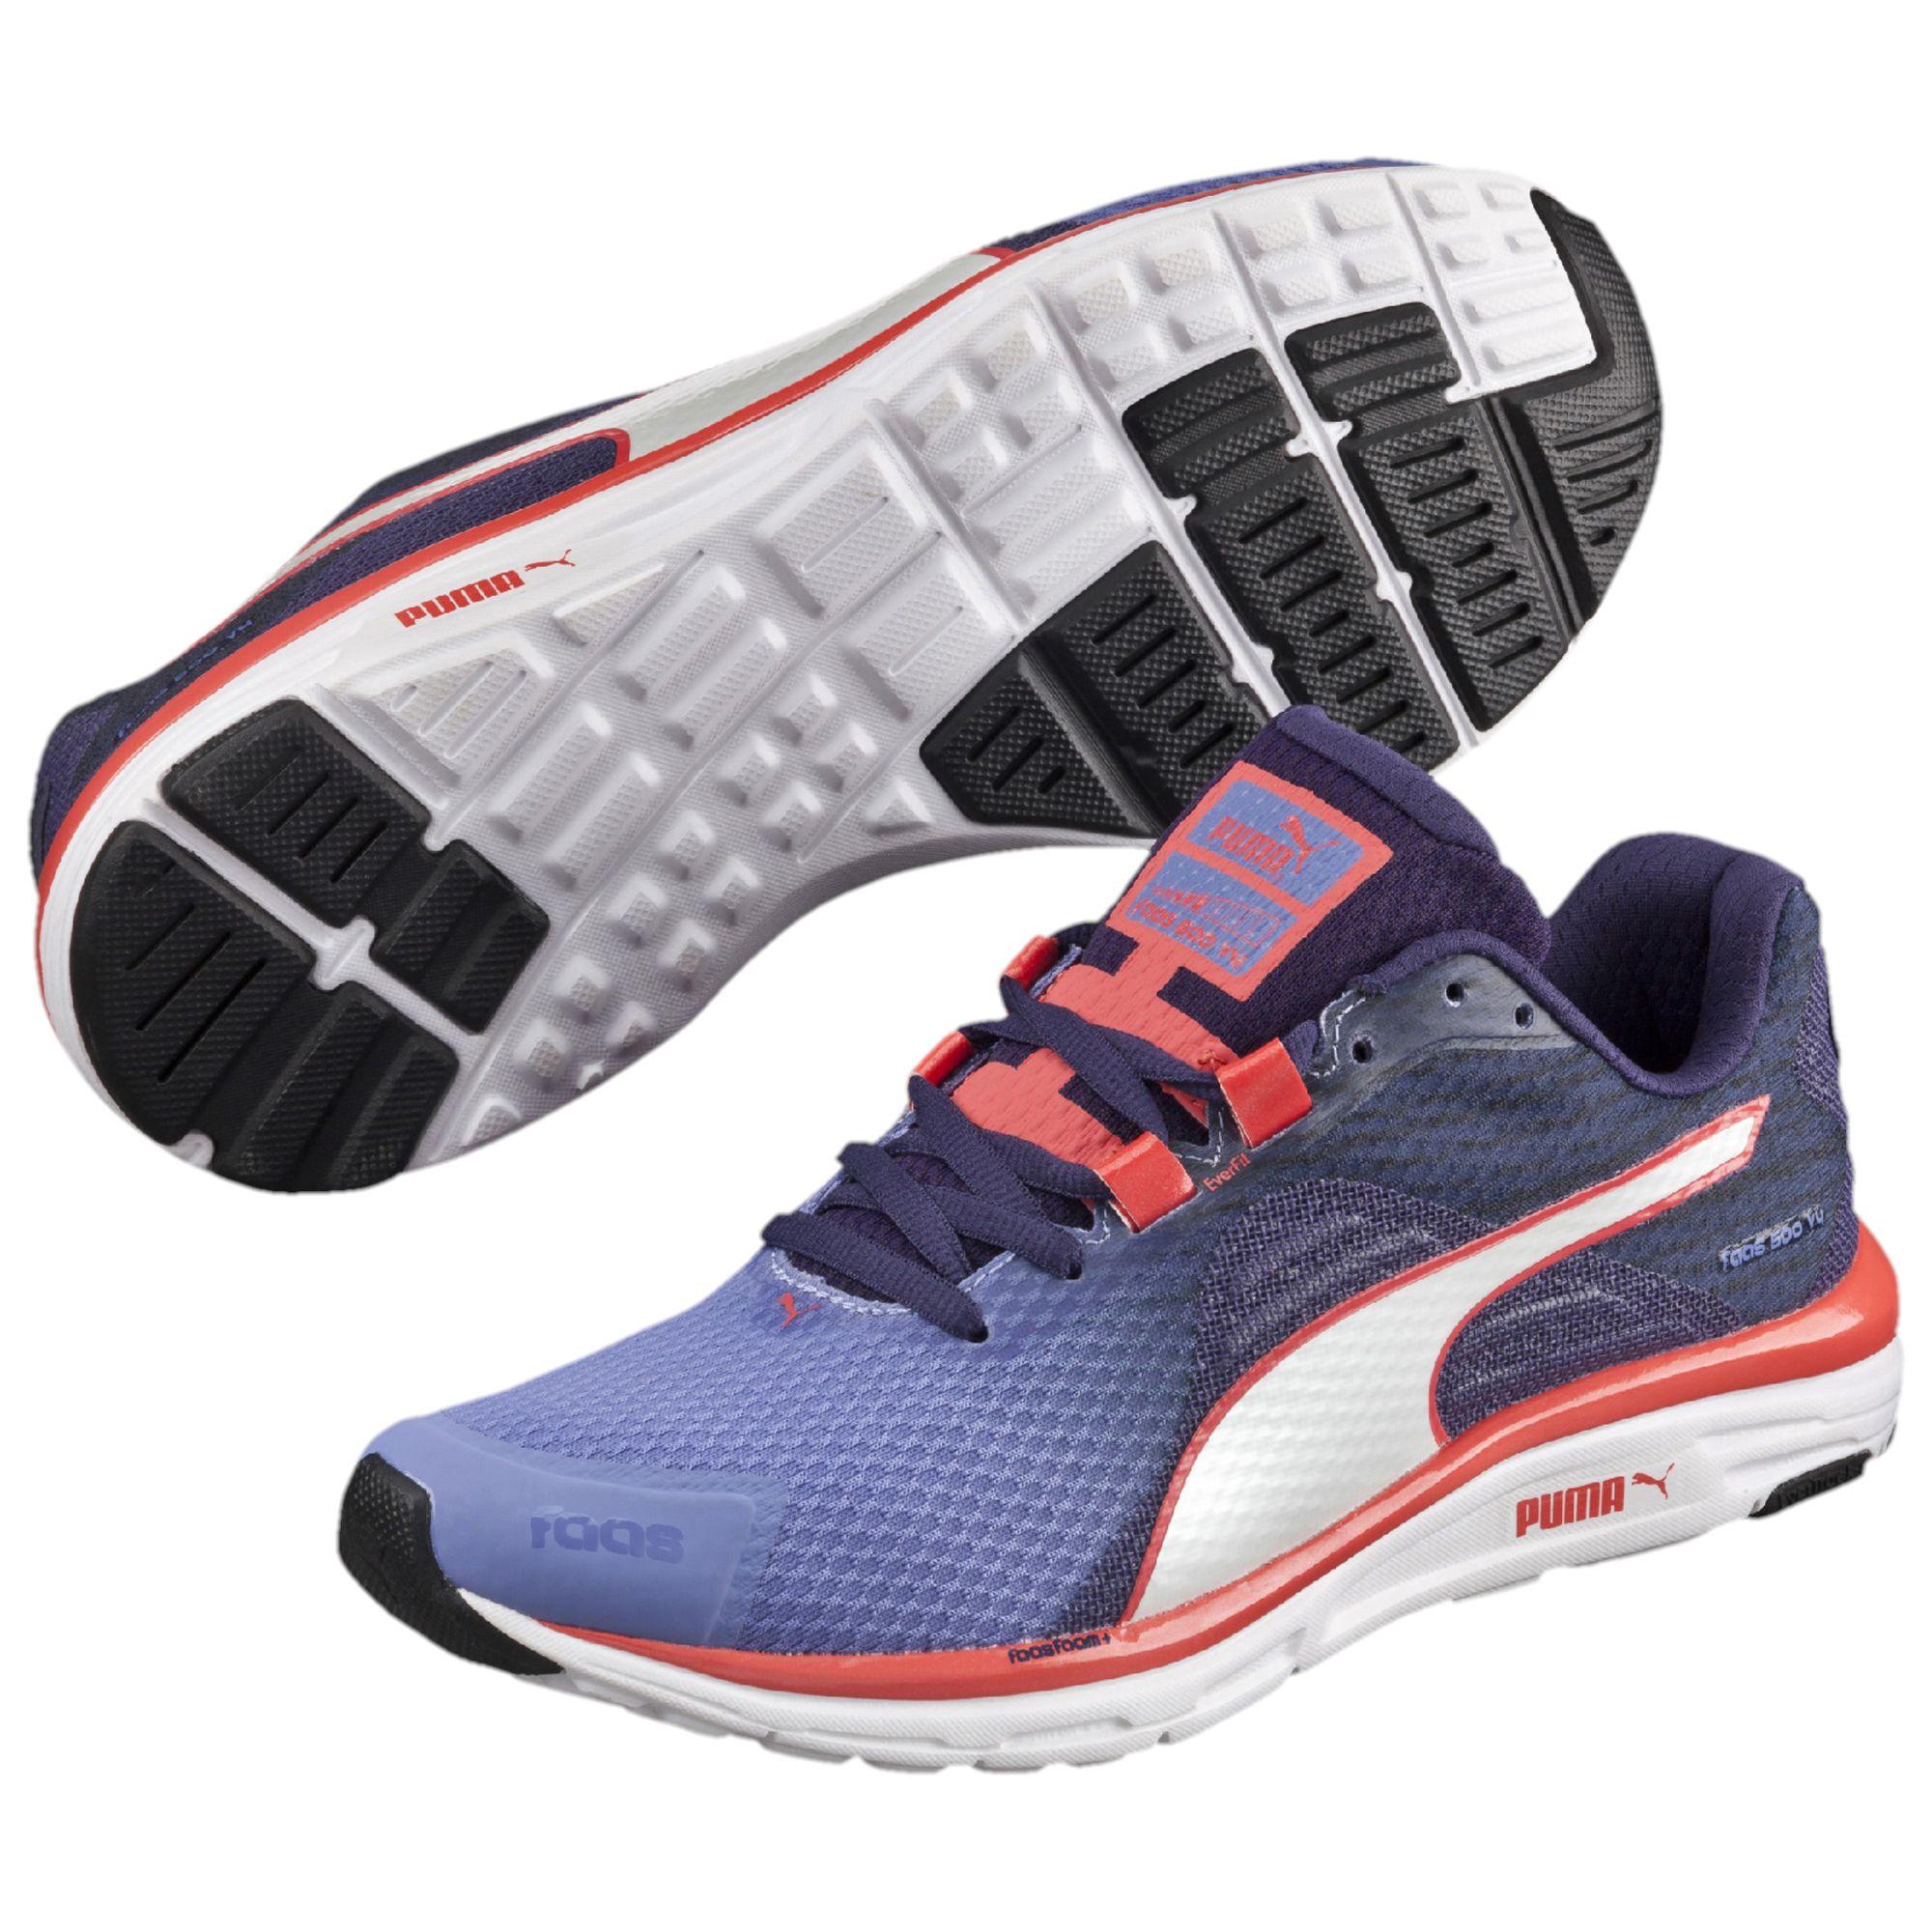 Puma Faas 500 V4 Ladies Running Shoes  7.5 UK